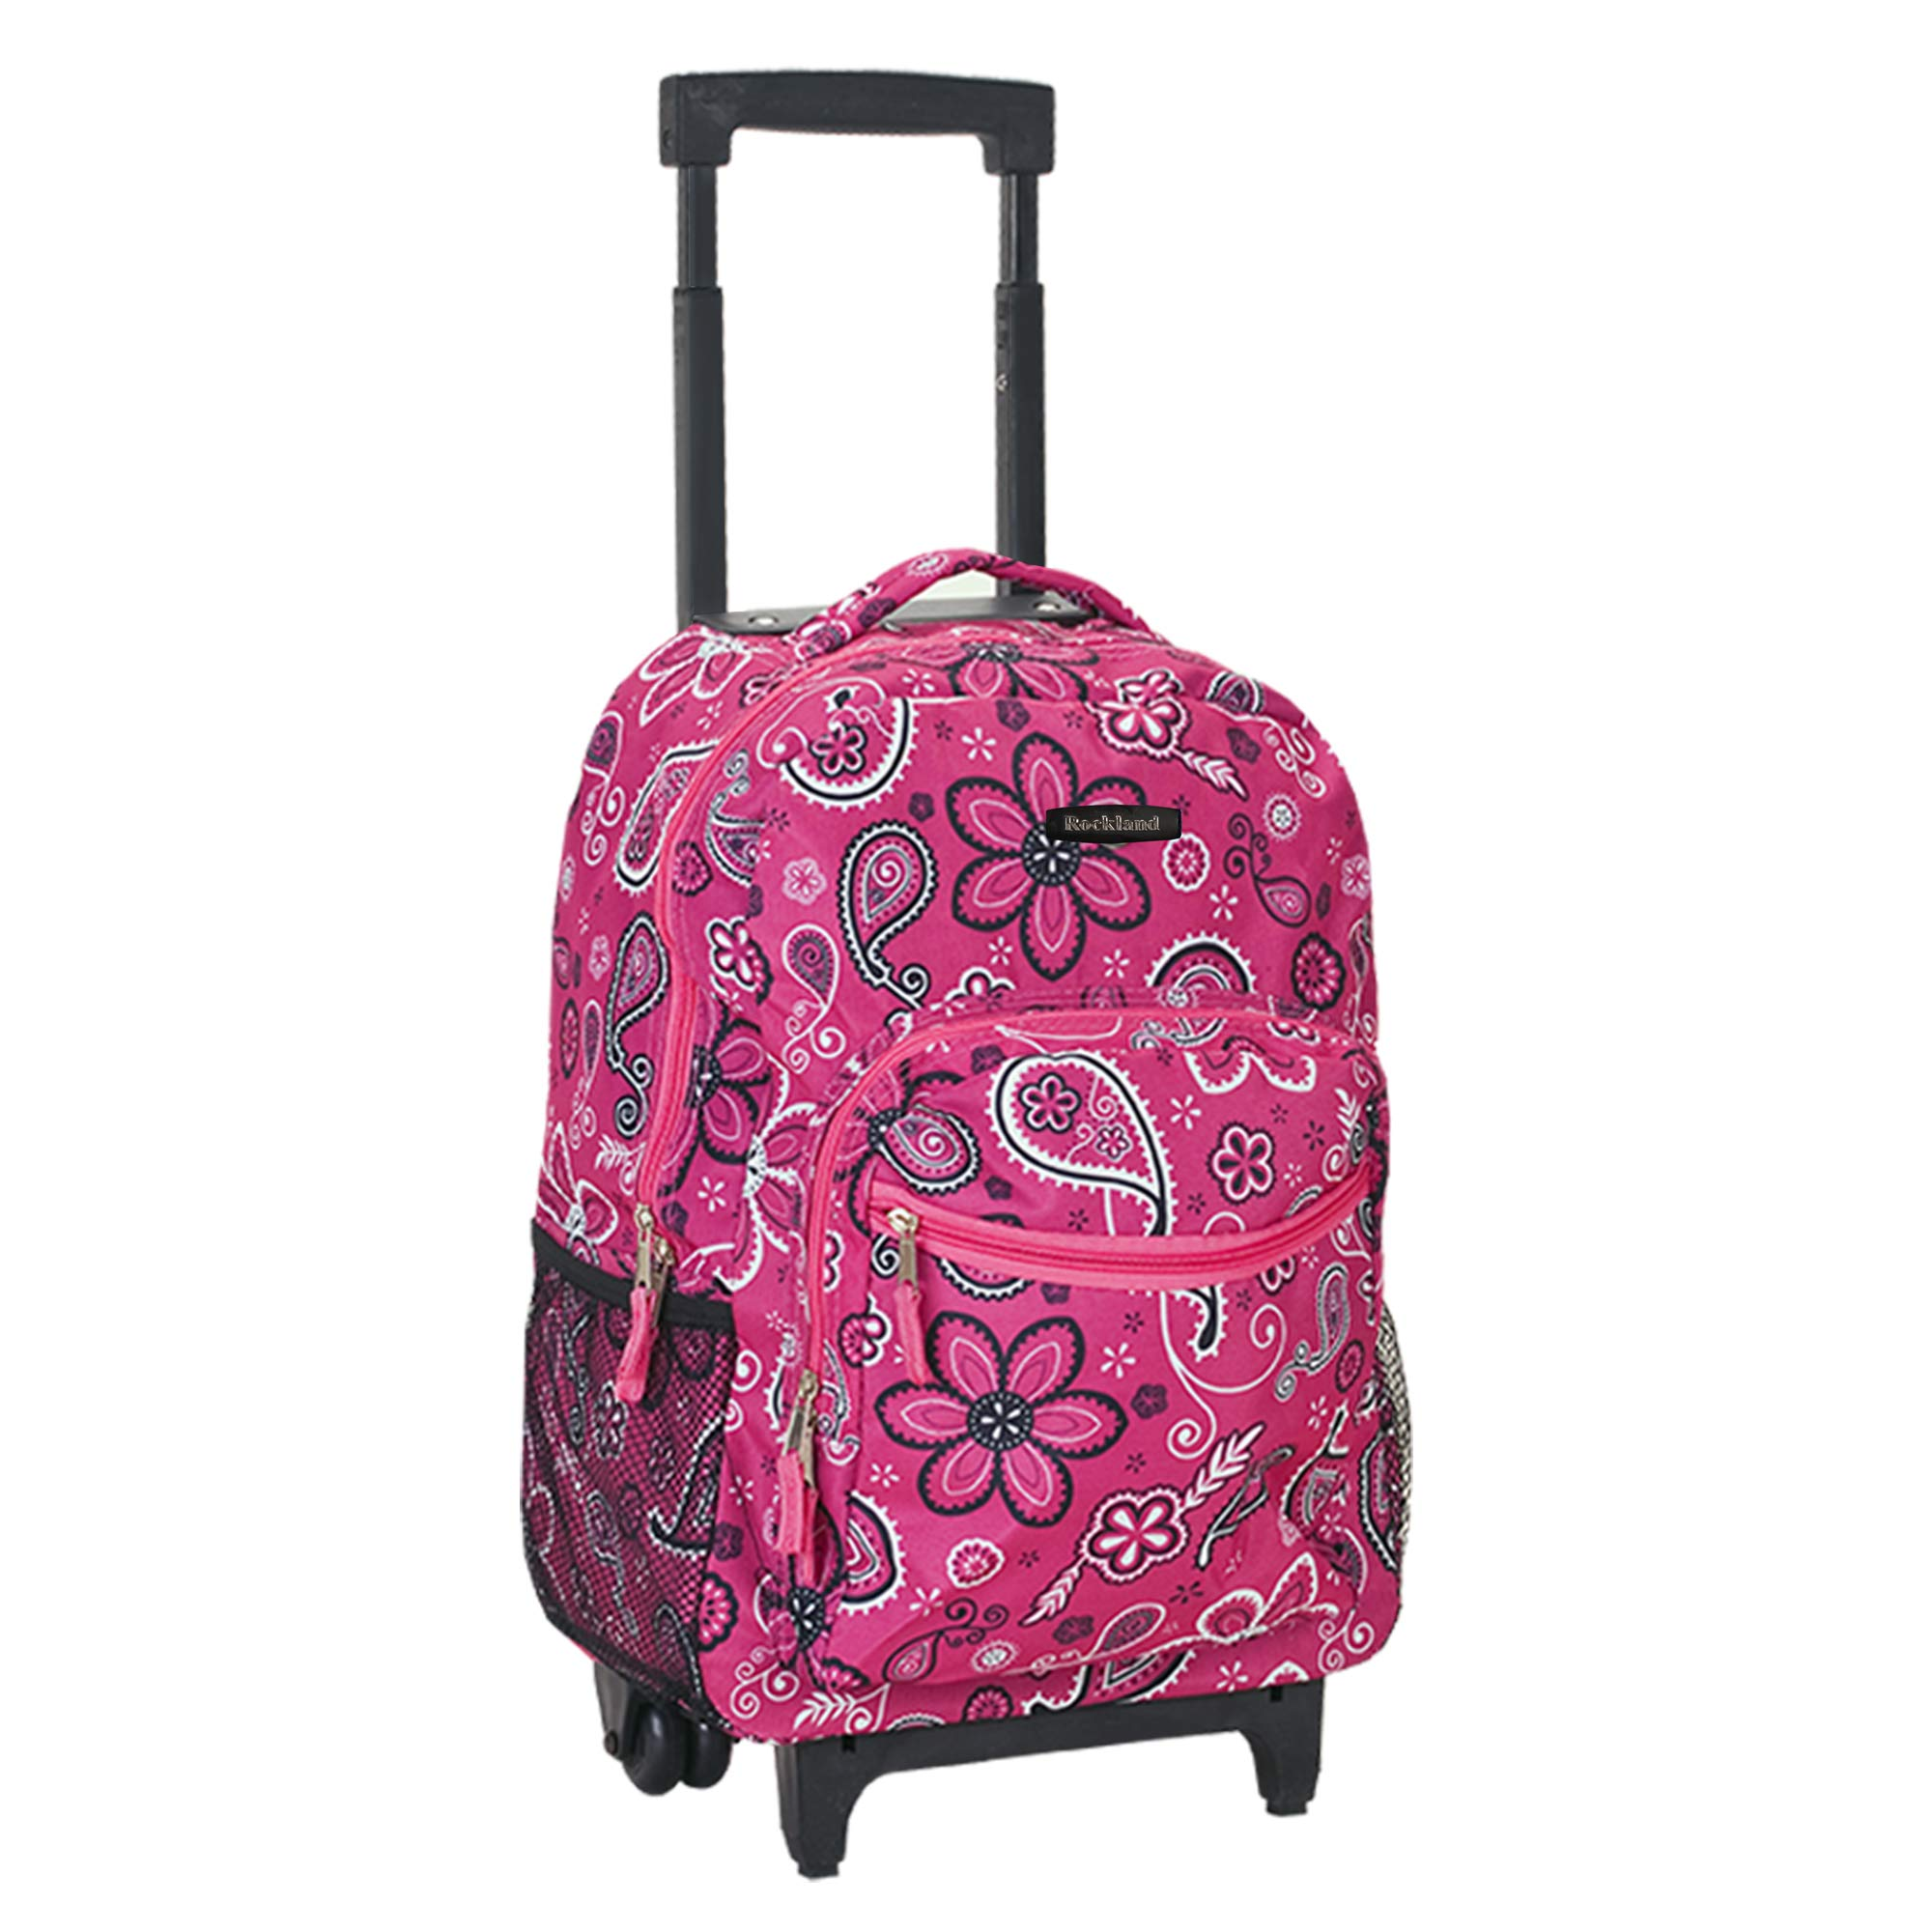 Rockland Luggage 17 Inch Rolling Backpack, Bandana, Medium